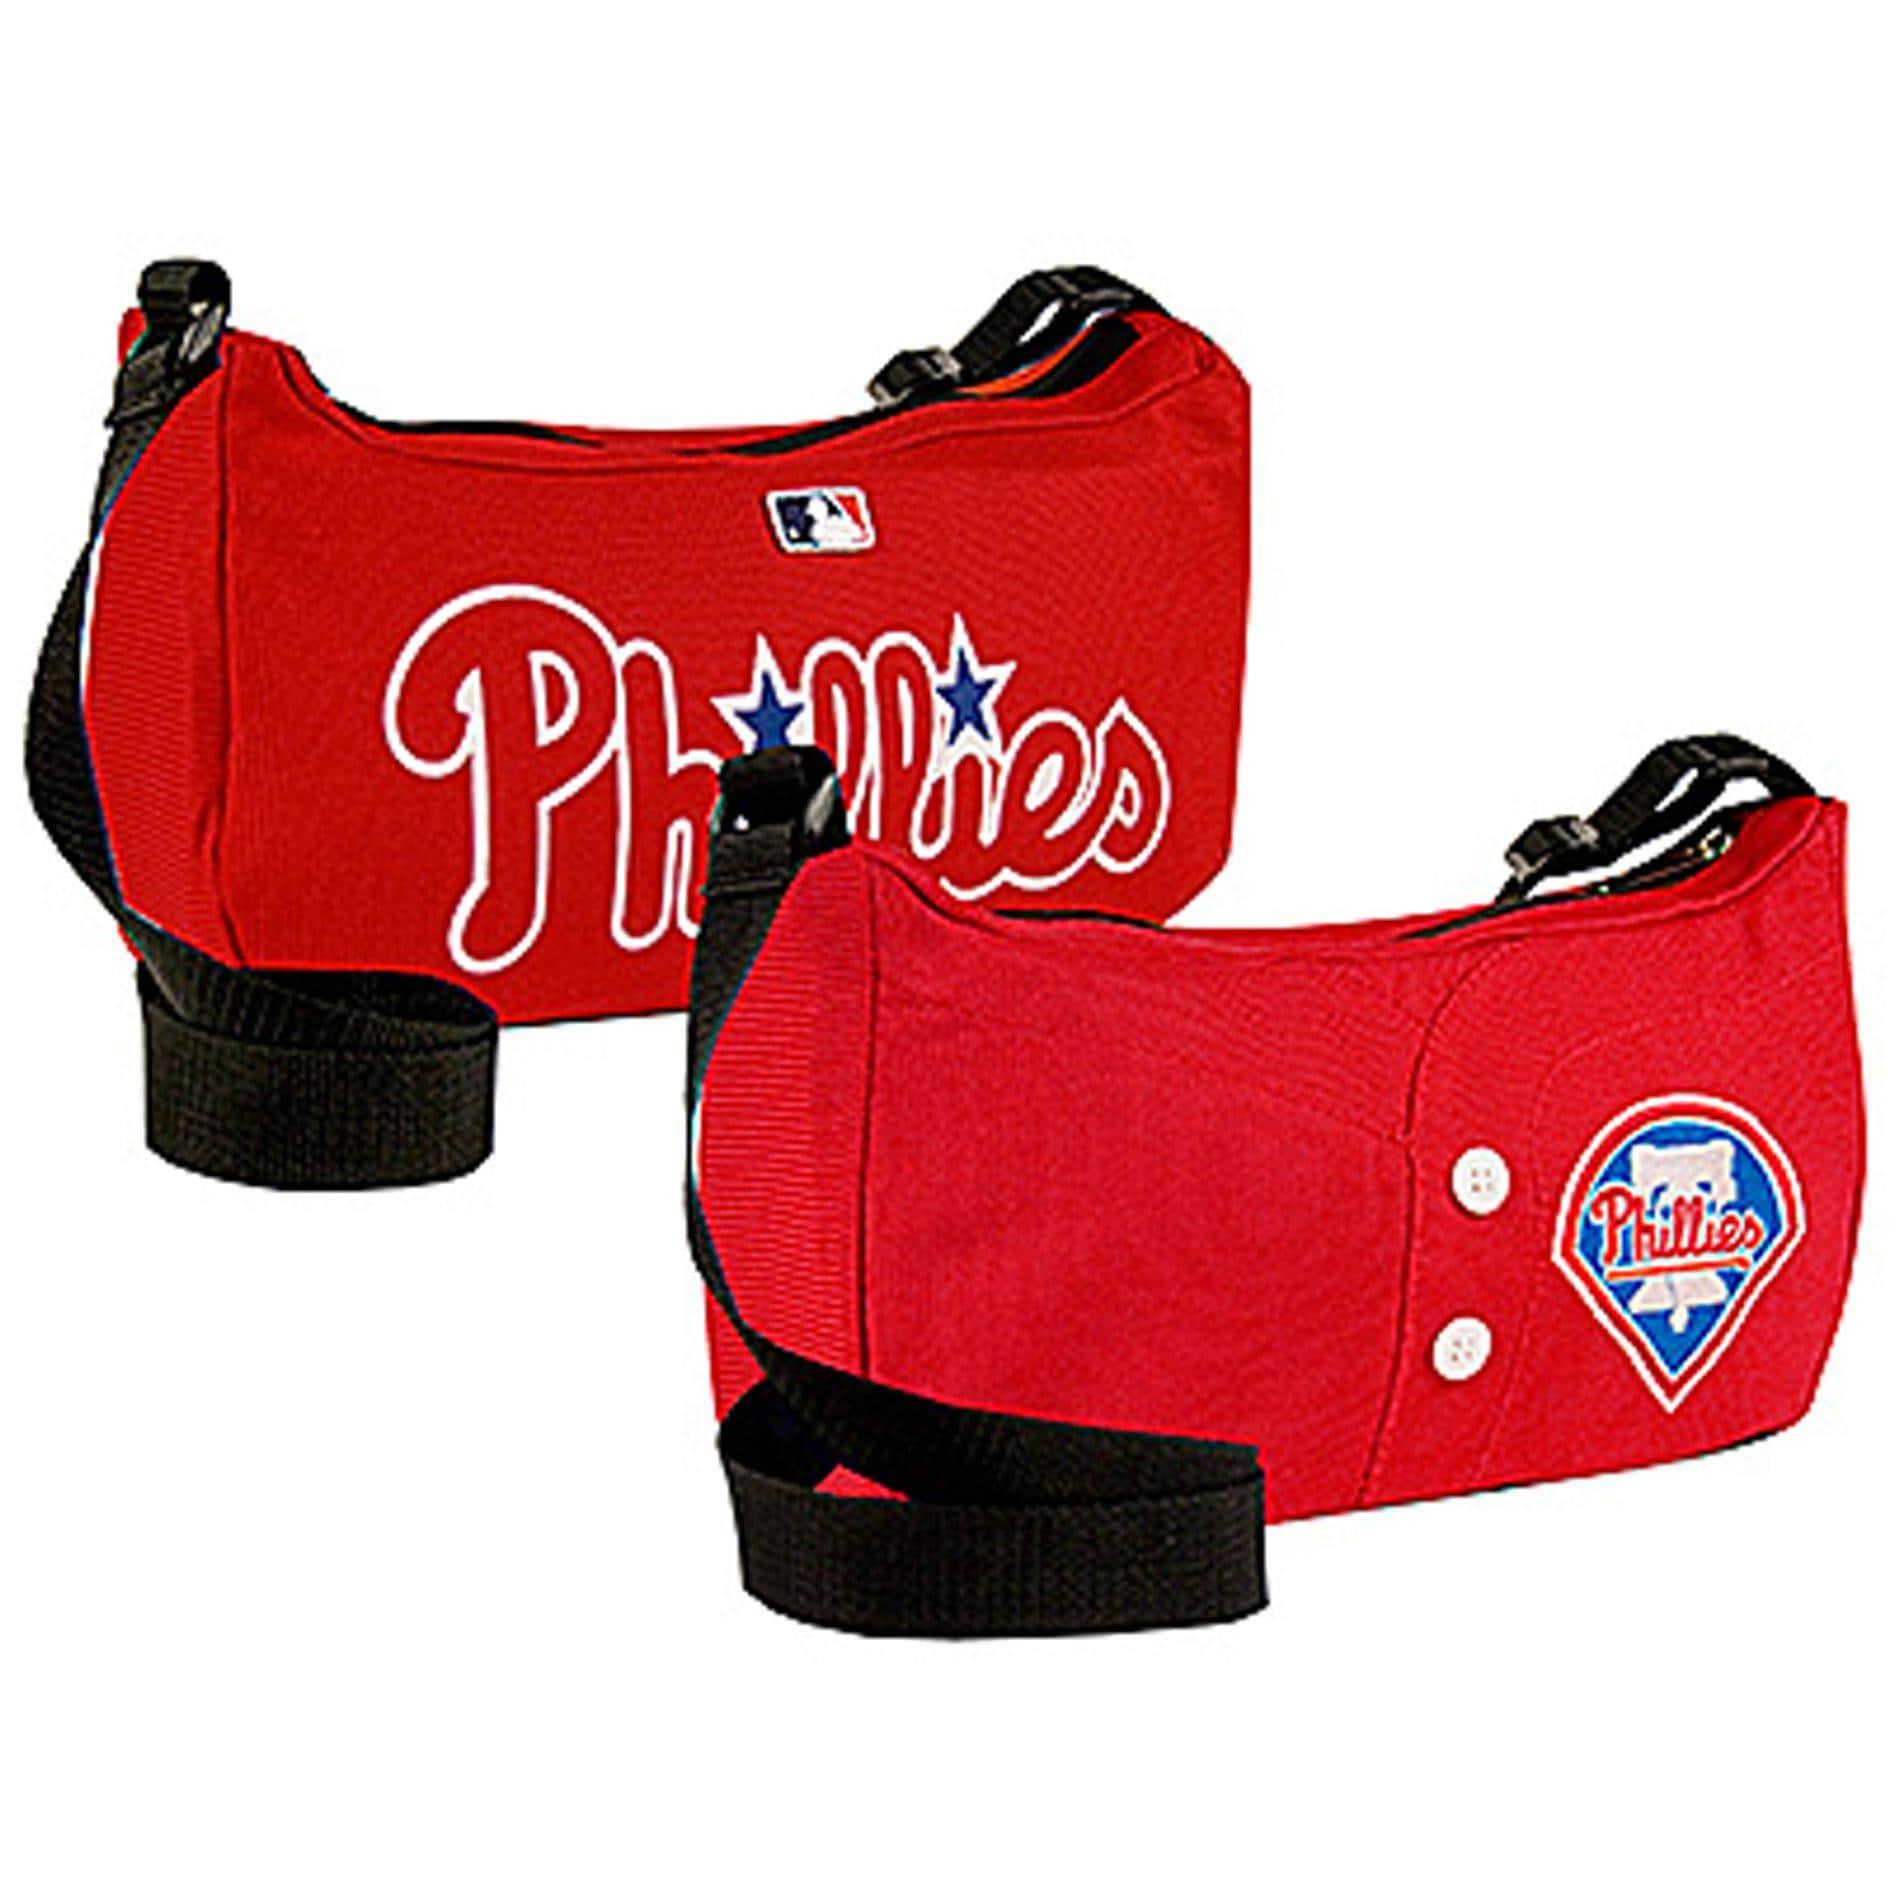 Little Earth MLB Philadelphia Phillies Jersey Purse